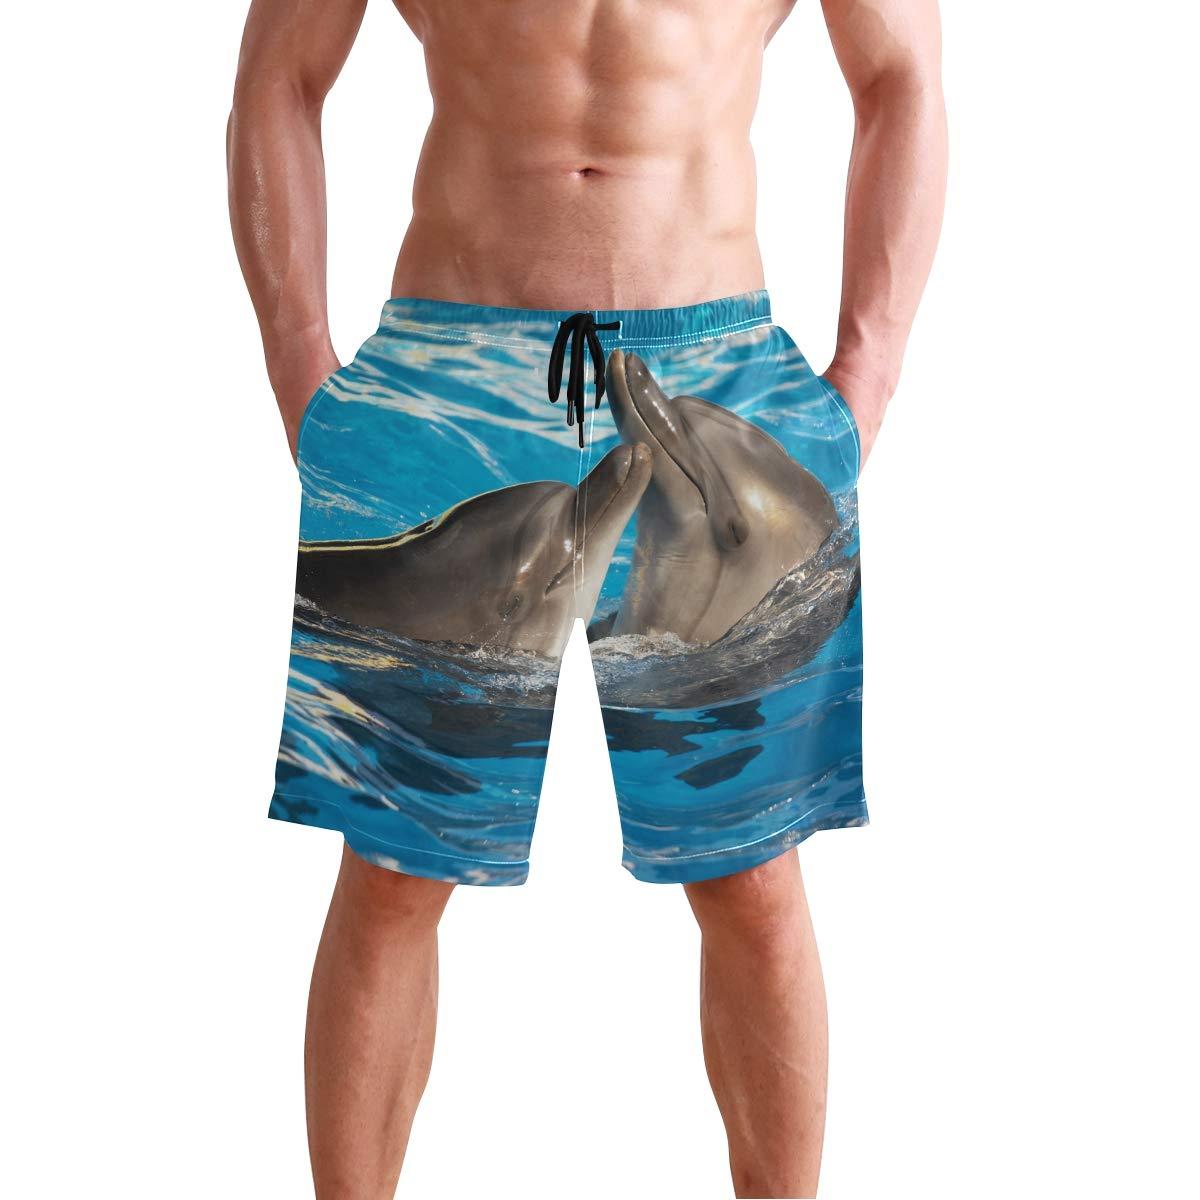 DEYYA Original Dolphin Love Summer Beach Shorts Pants Mens Swim Trunks Board Short for Men